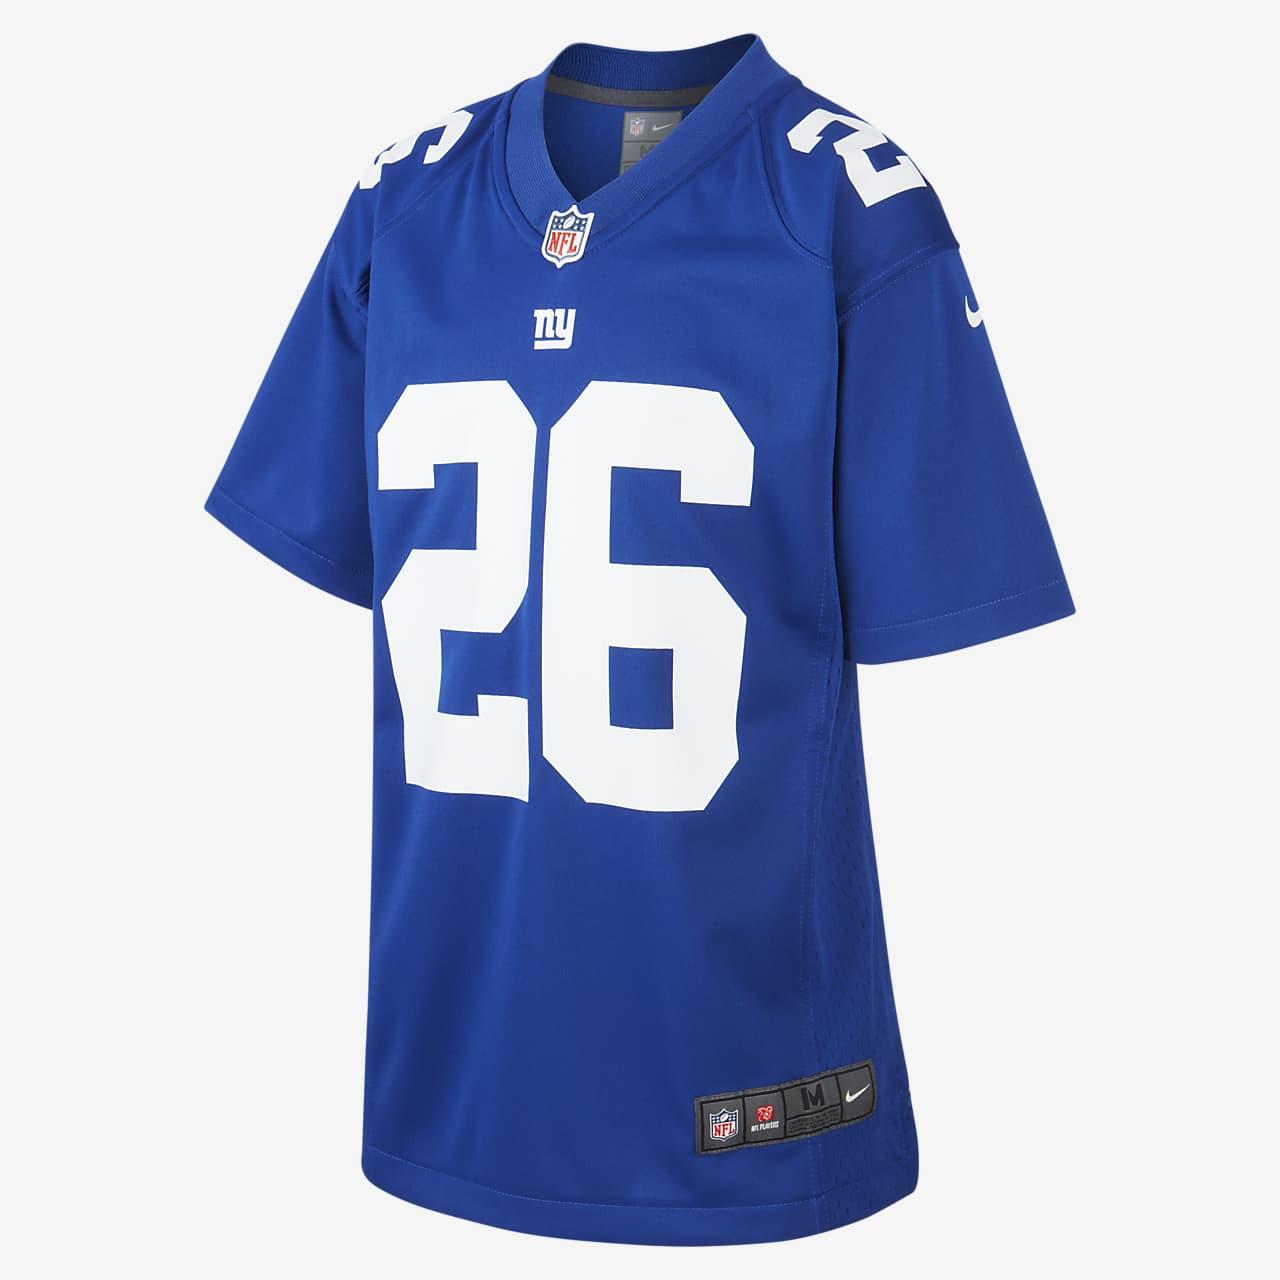 NFL New York Giants Game Jersey (Saquon Barkley) Older Kids' American Football Jersey